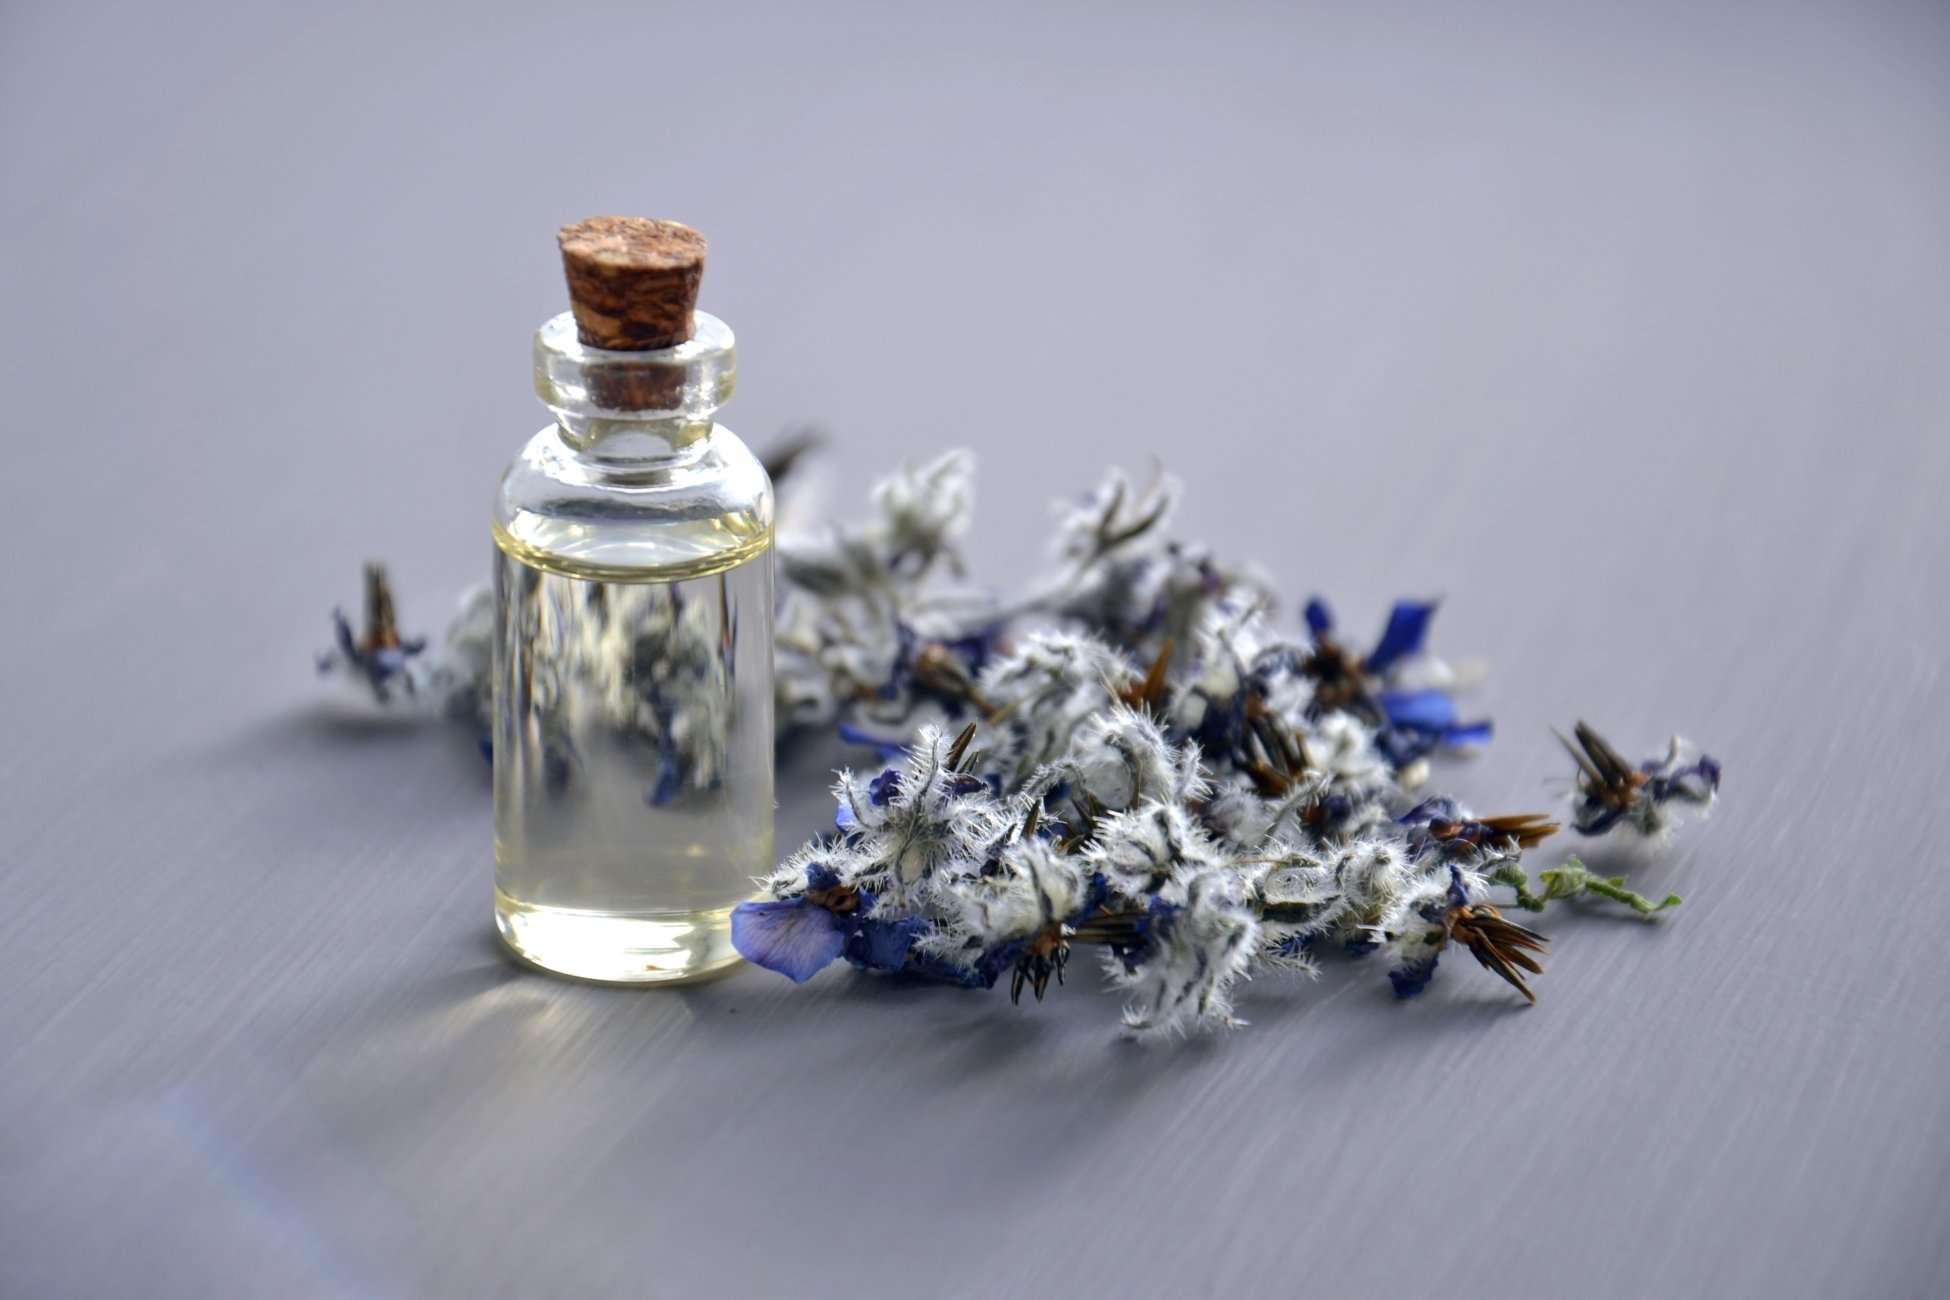 The Benefits of Using Massage Oils